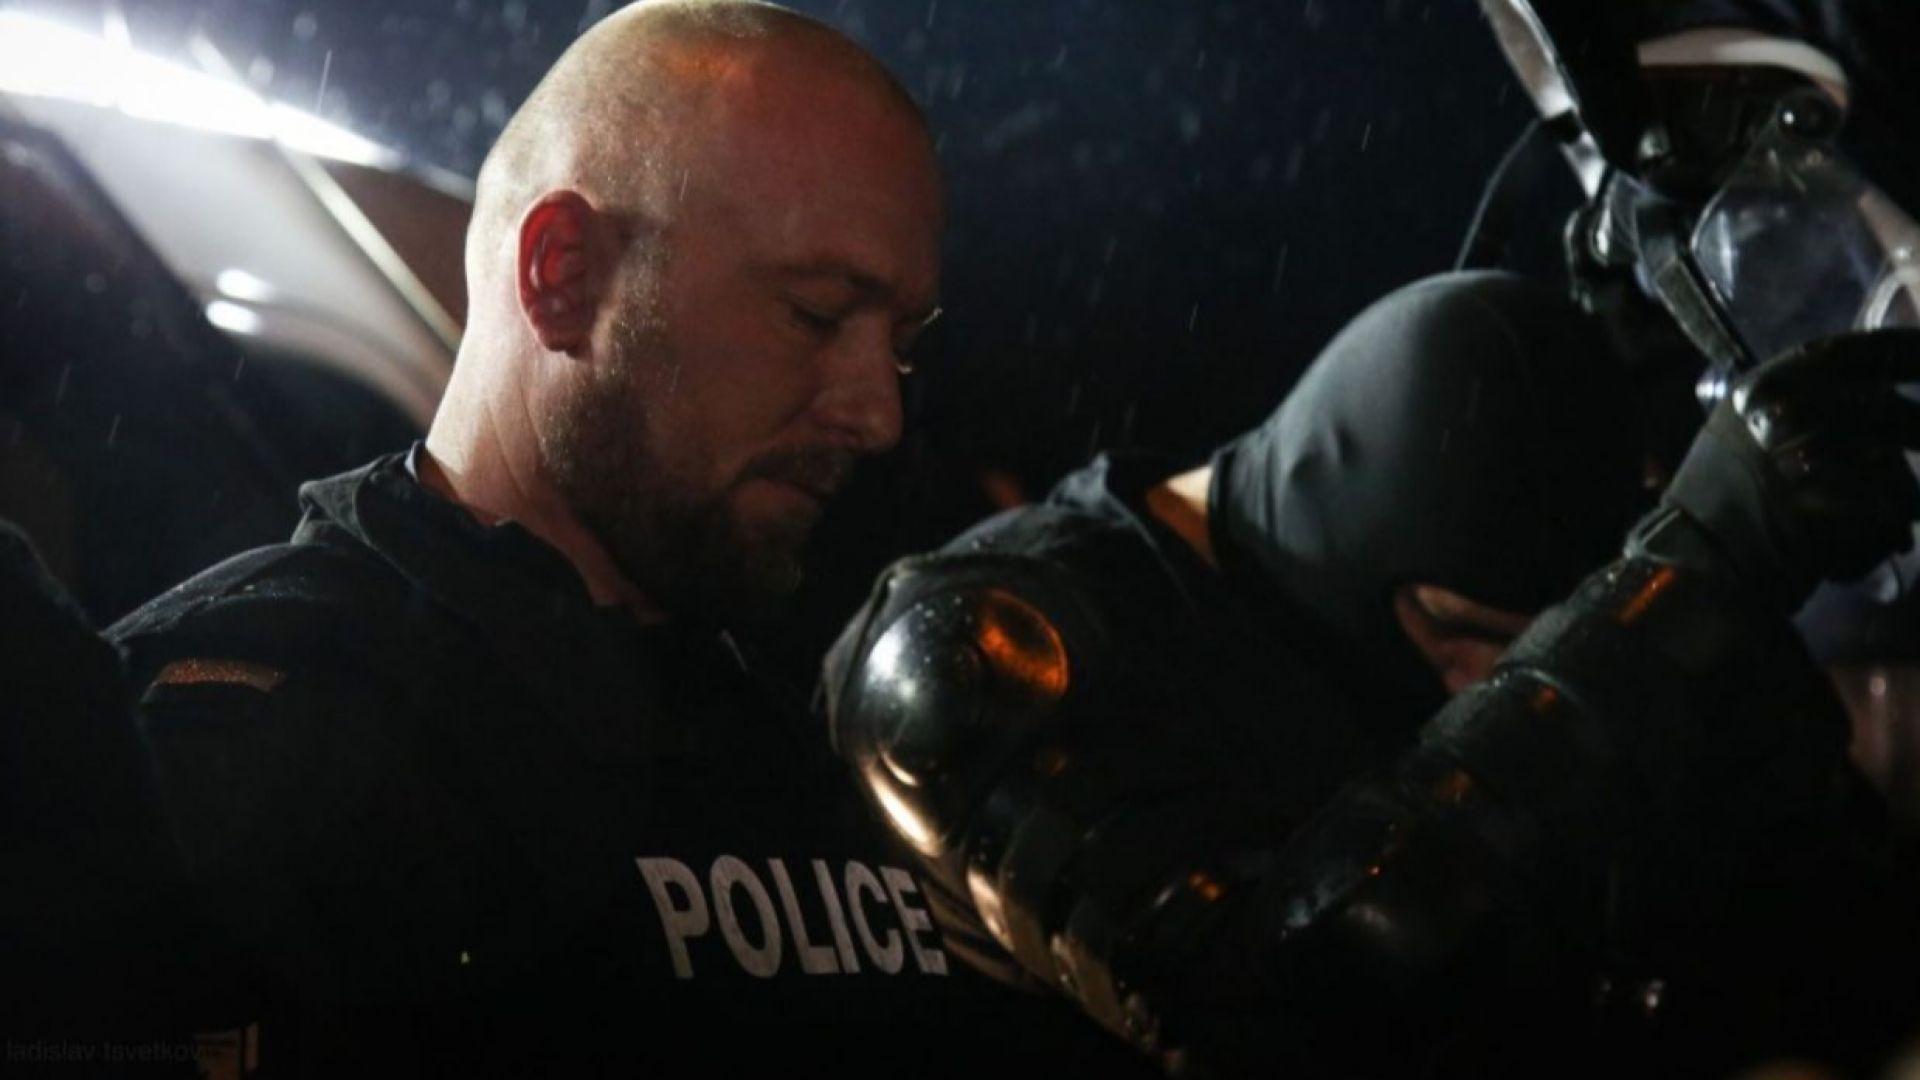 7 души с боксове и палки задържани в Габрово, жандармеристи свалиха каските